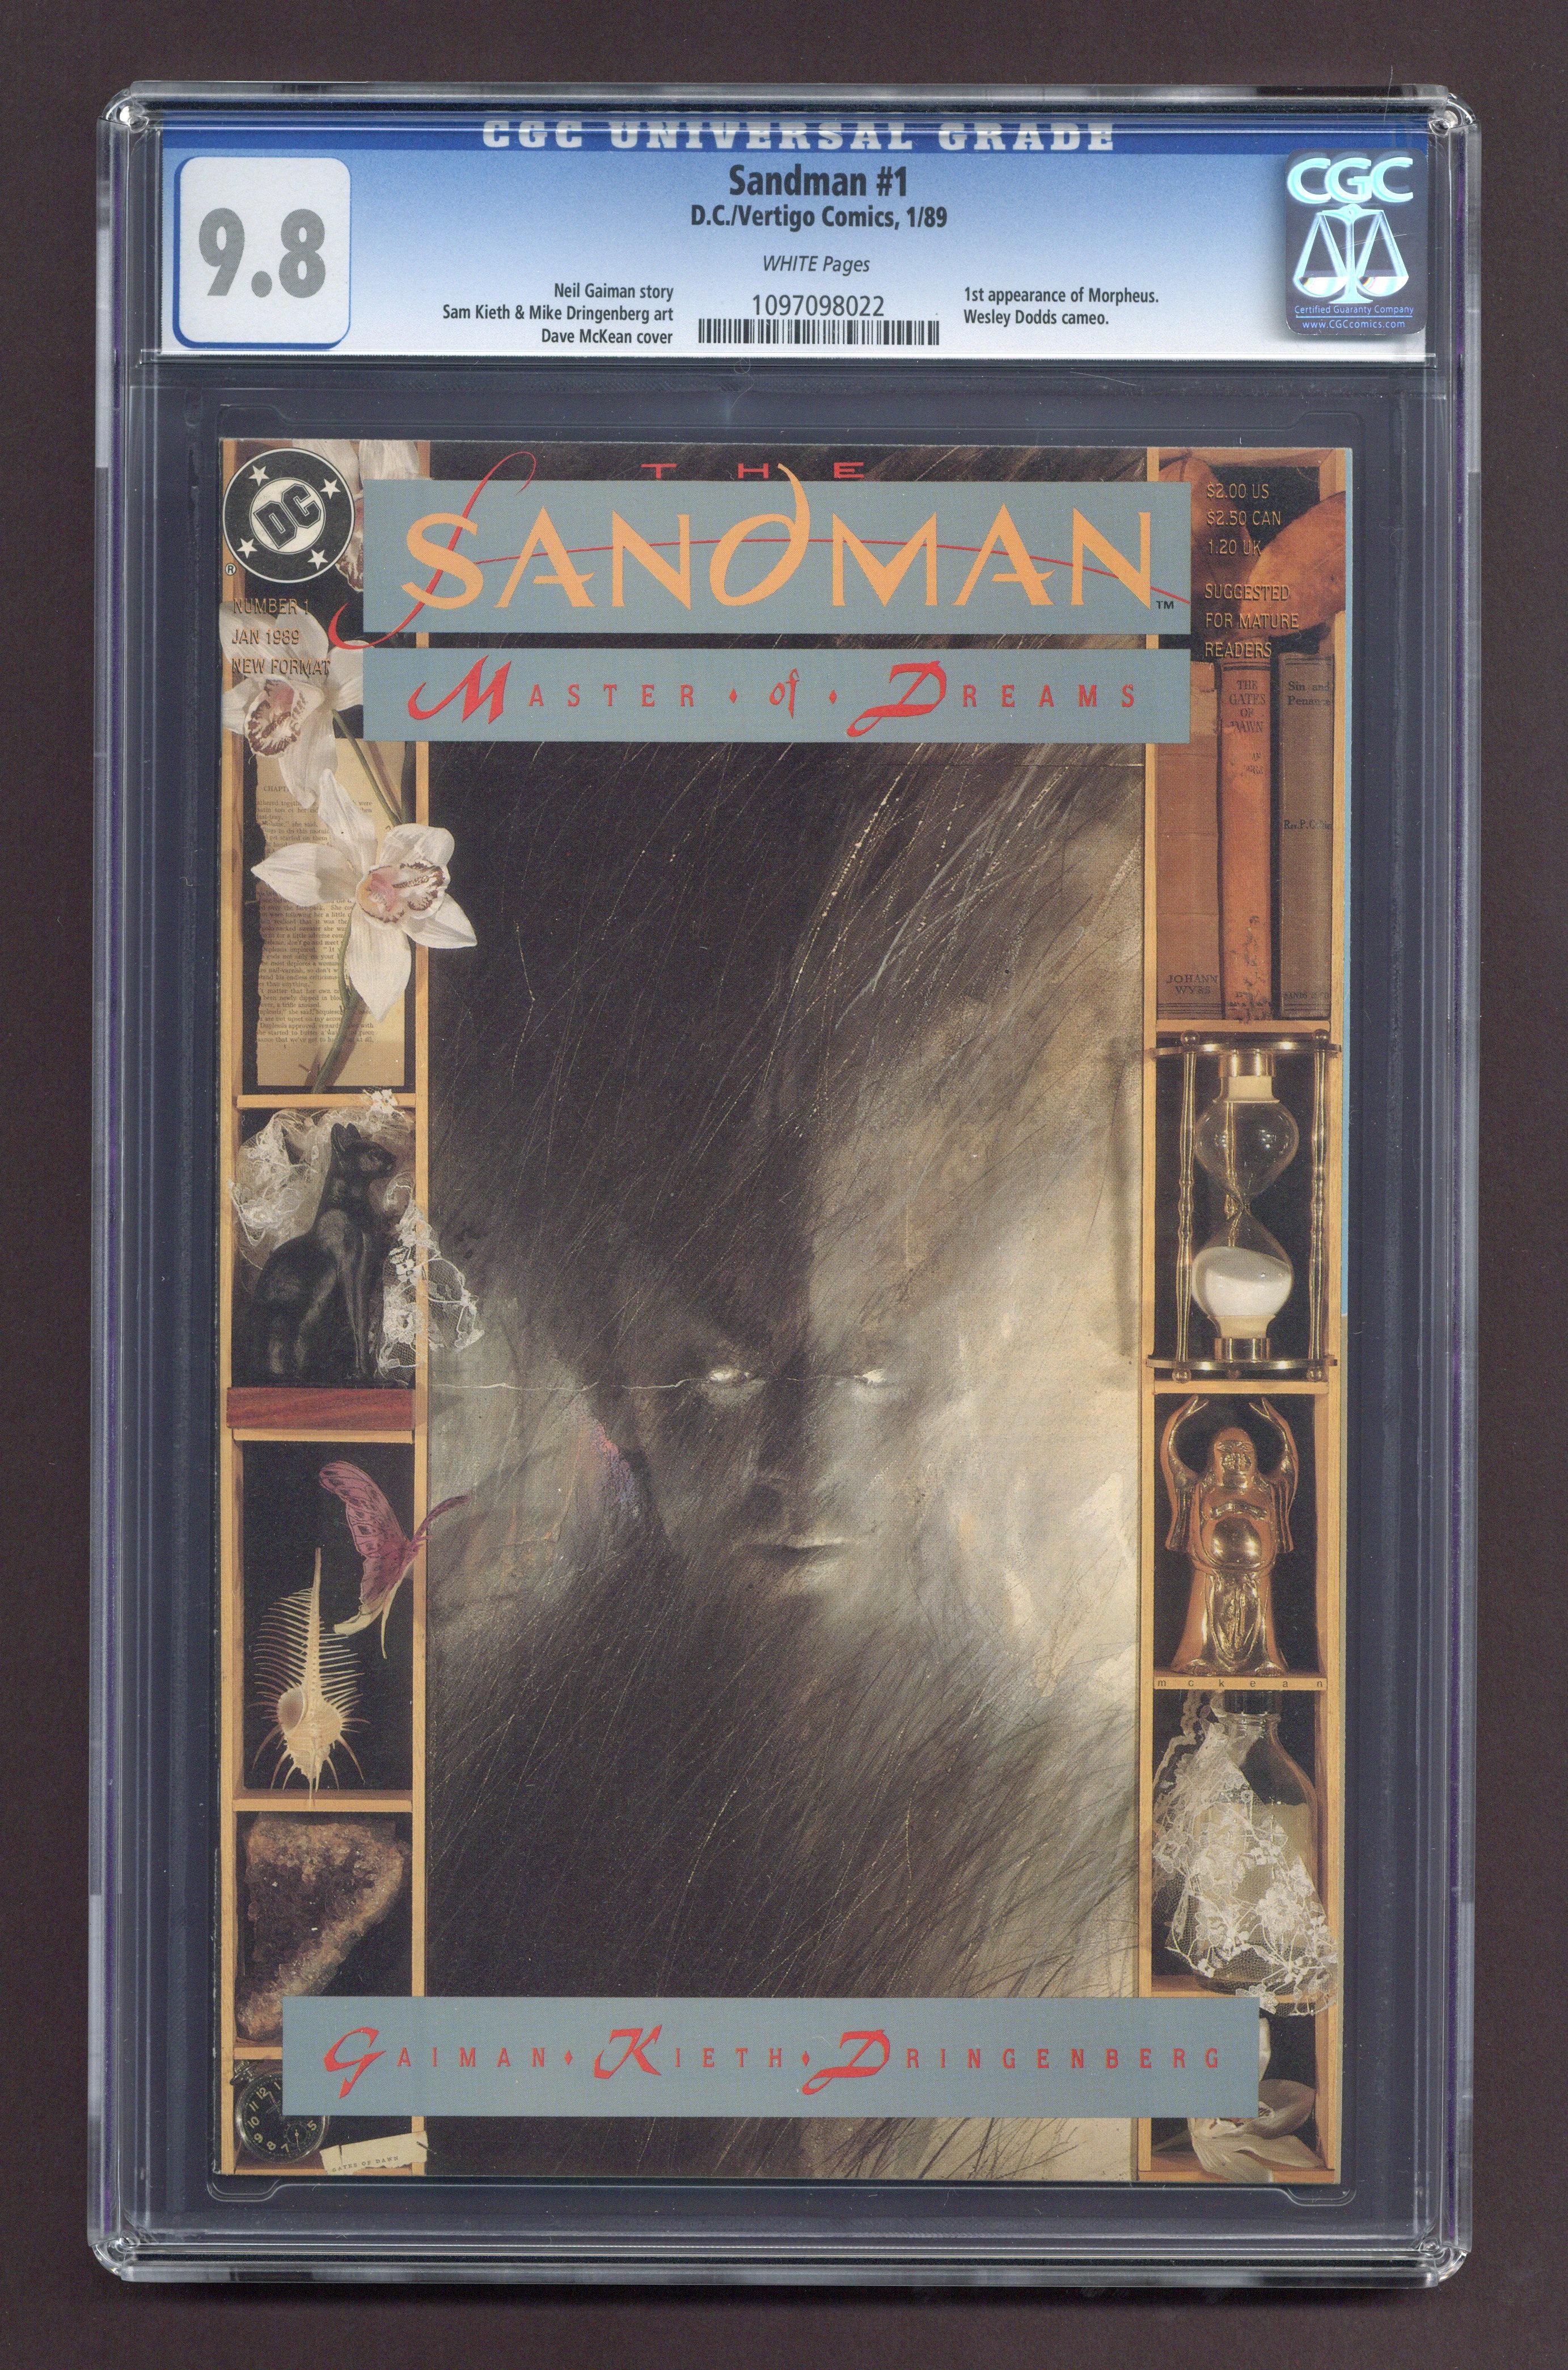 Sandman #1 CGC 9.8 DC/Vertigo Neil Gaimen